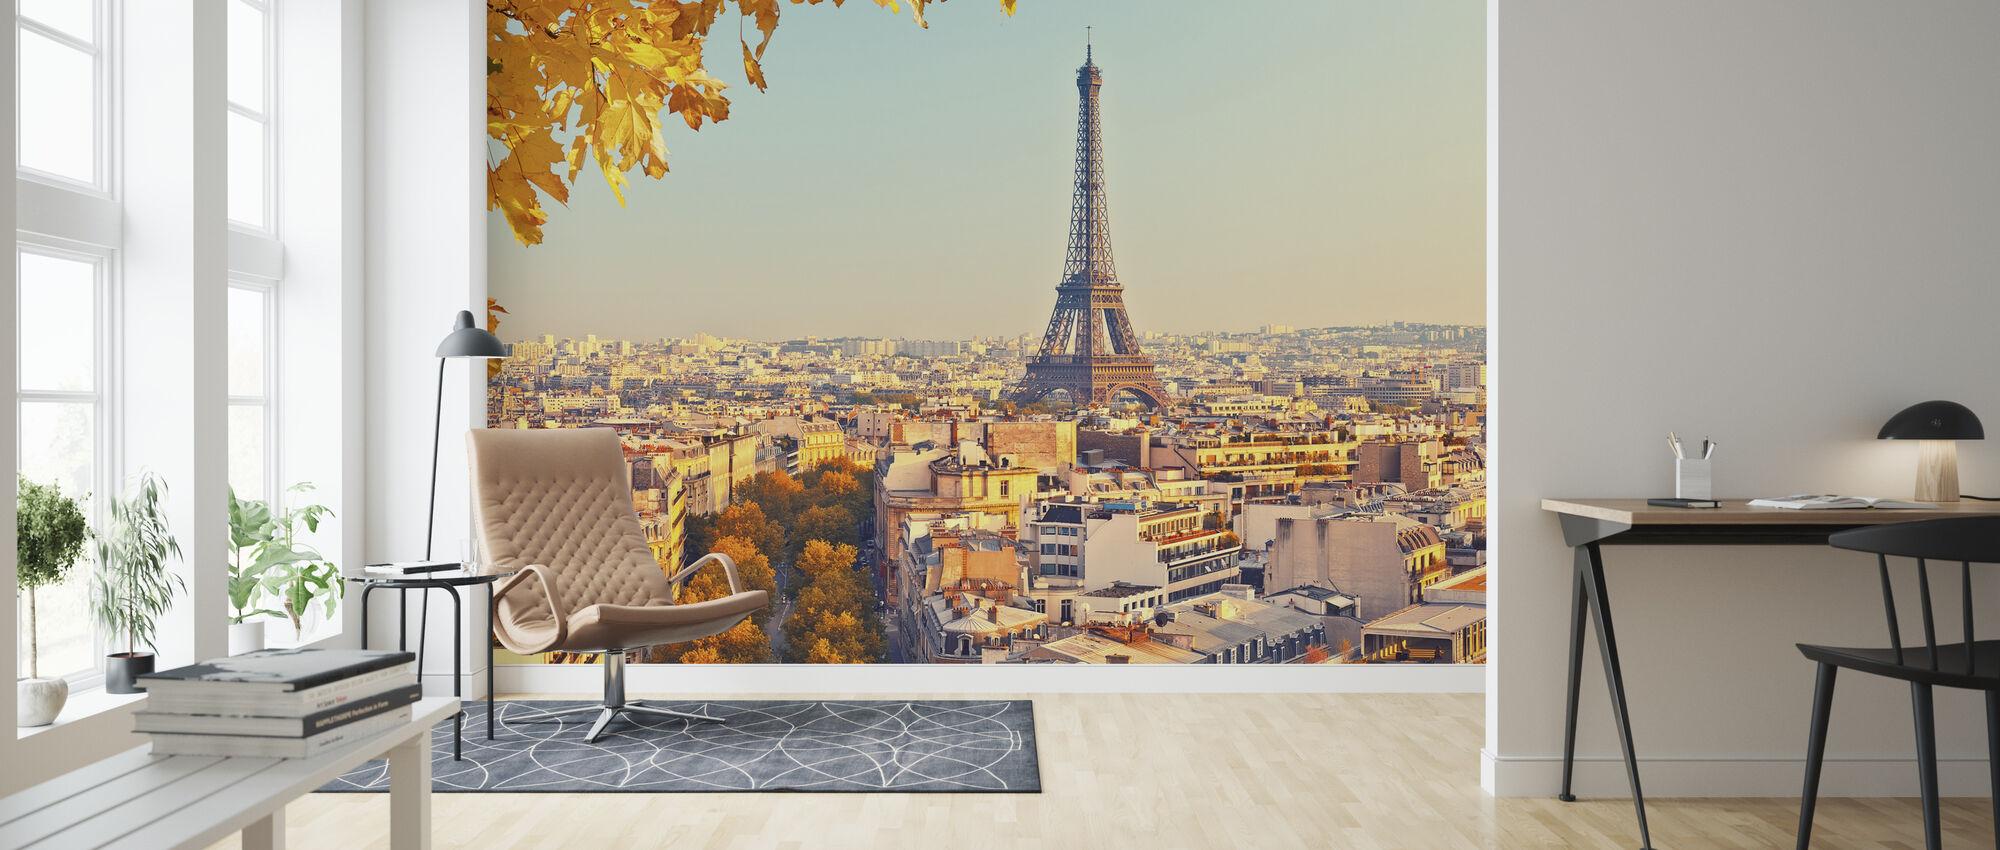 Eiffel Tower Autumn View - Wallpaper - Living Room